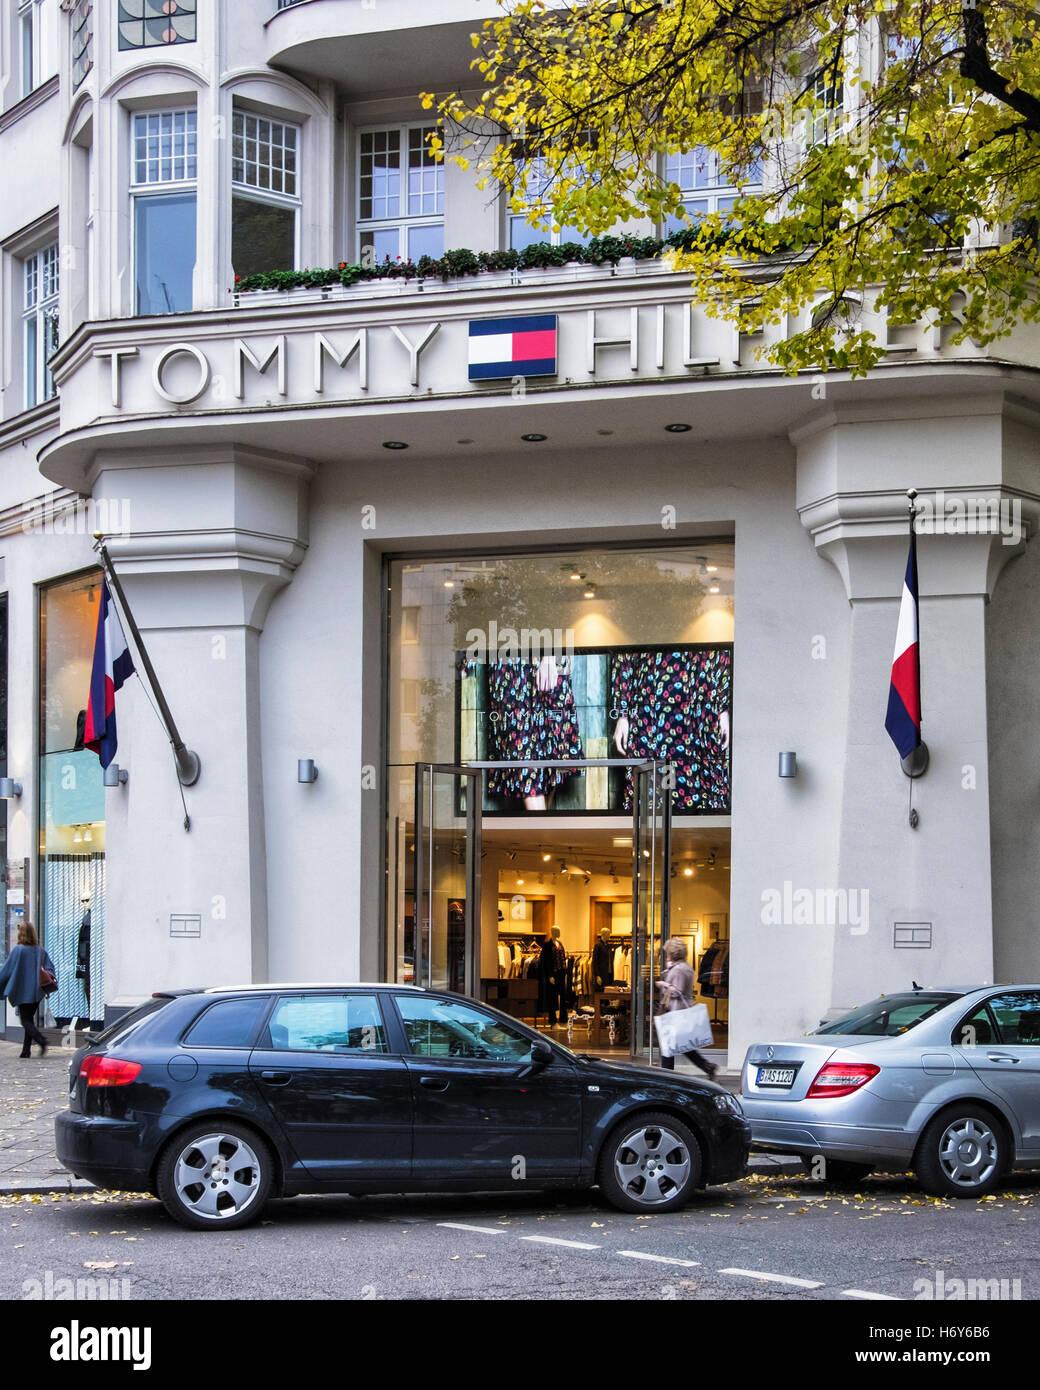 Tommy Hilfiger Store for upmarket Men's clothing, Kurfürstendamm, Berlin - Stock Image